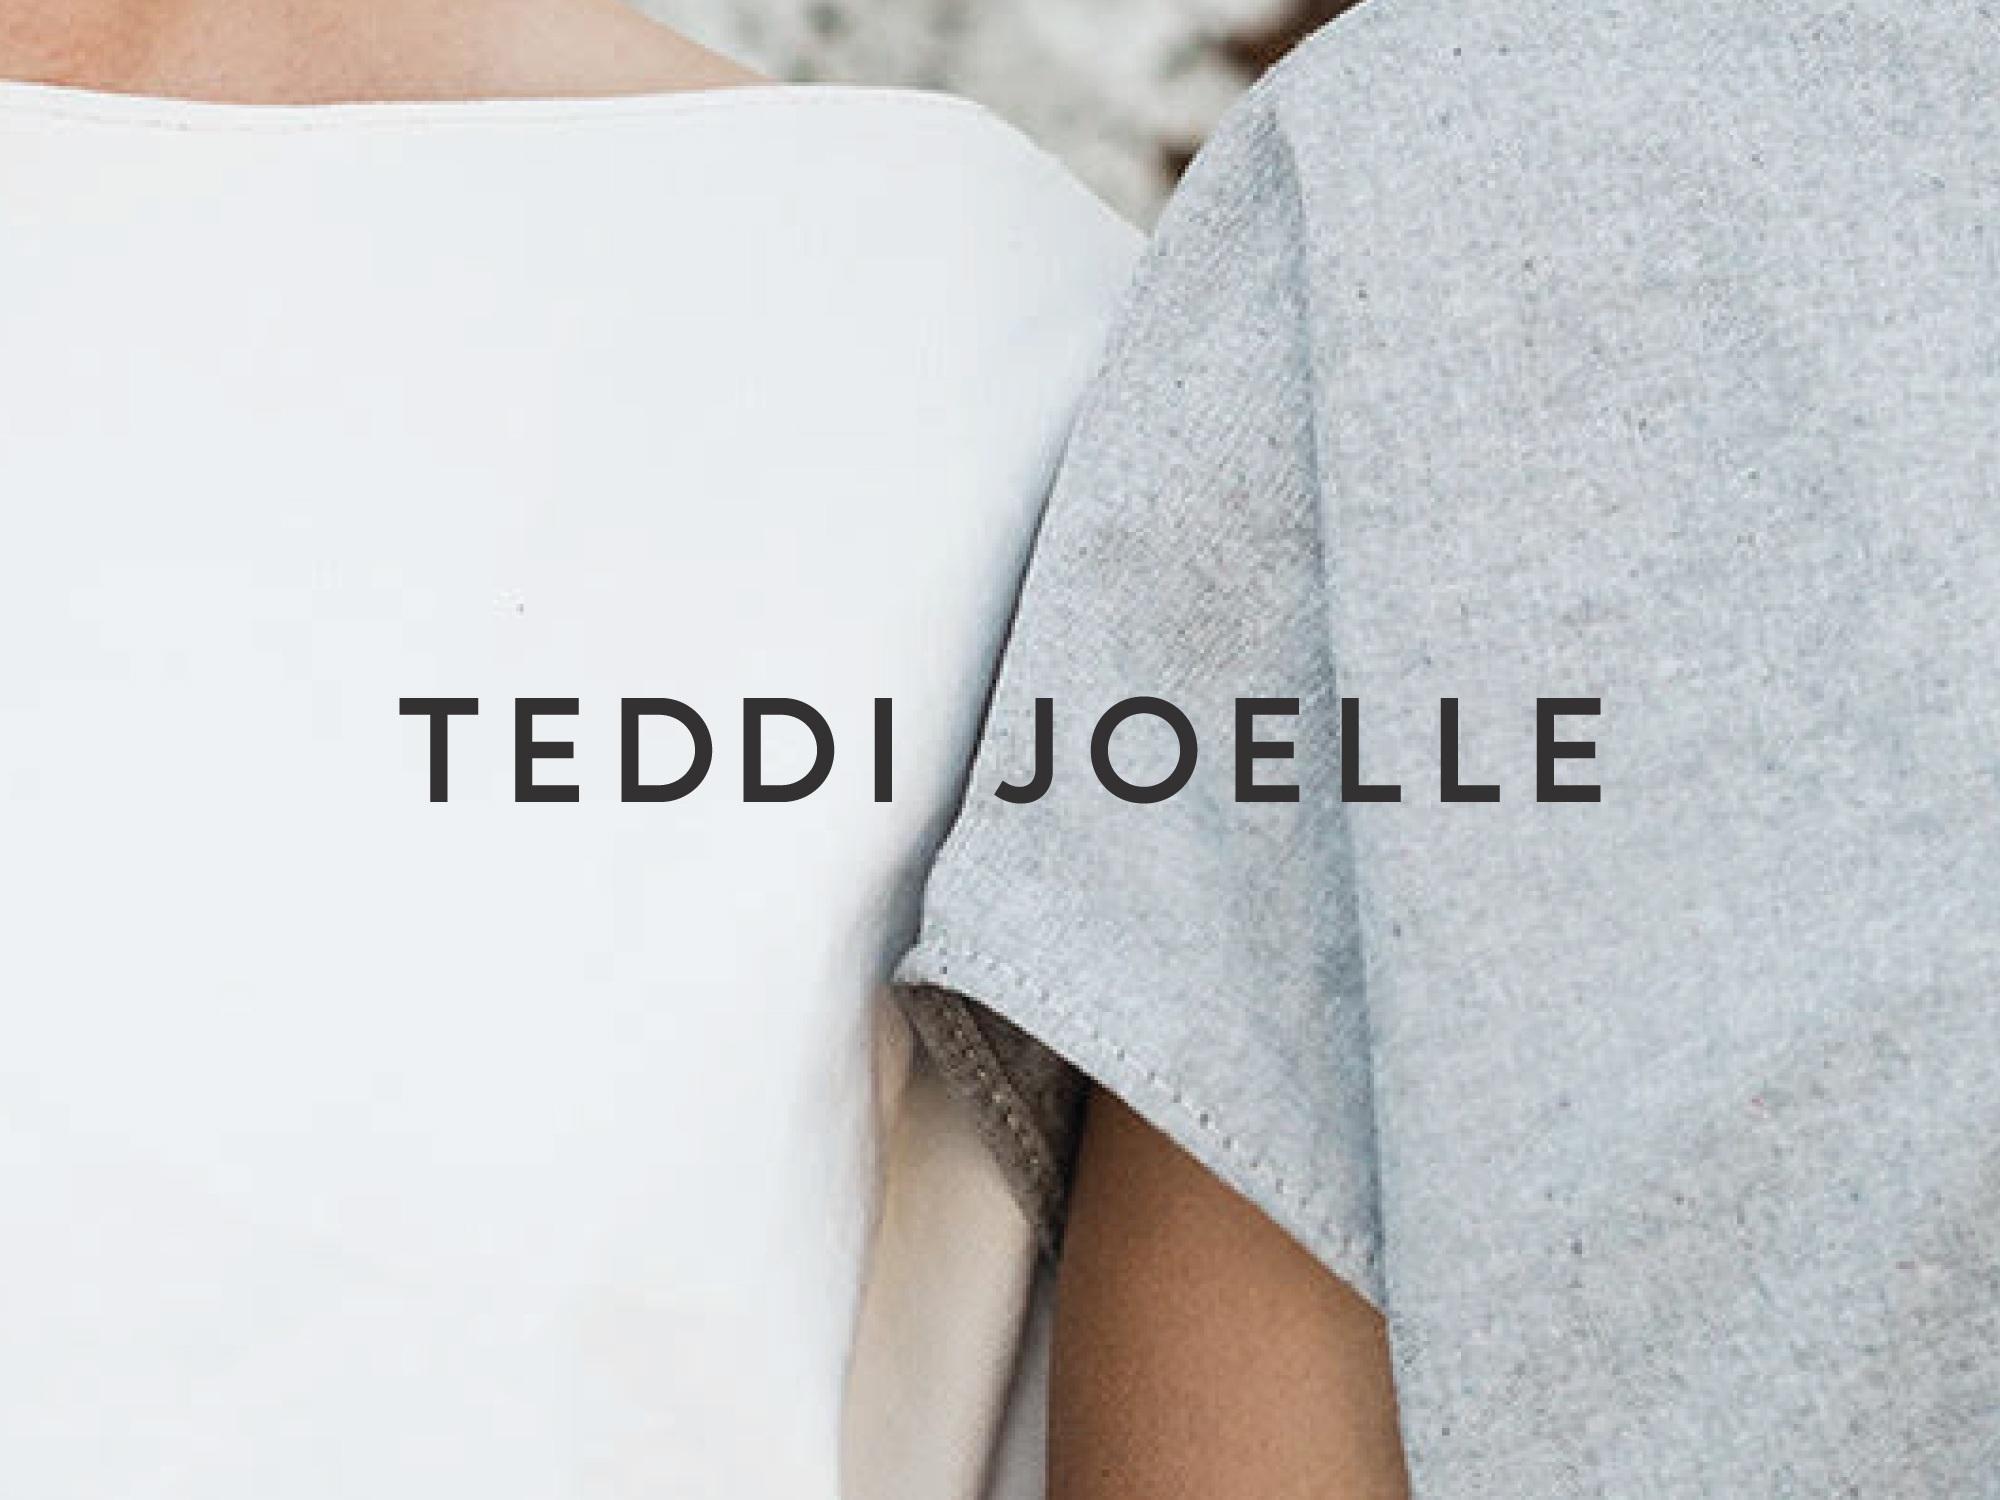 Image2_TeddiJoelle.jpg